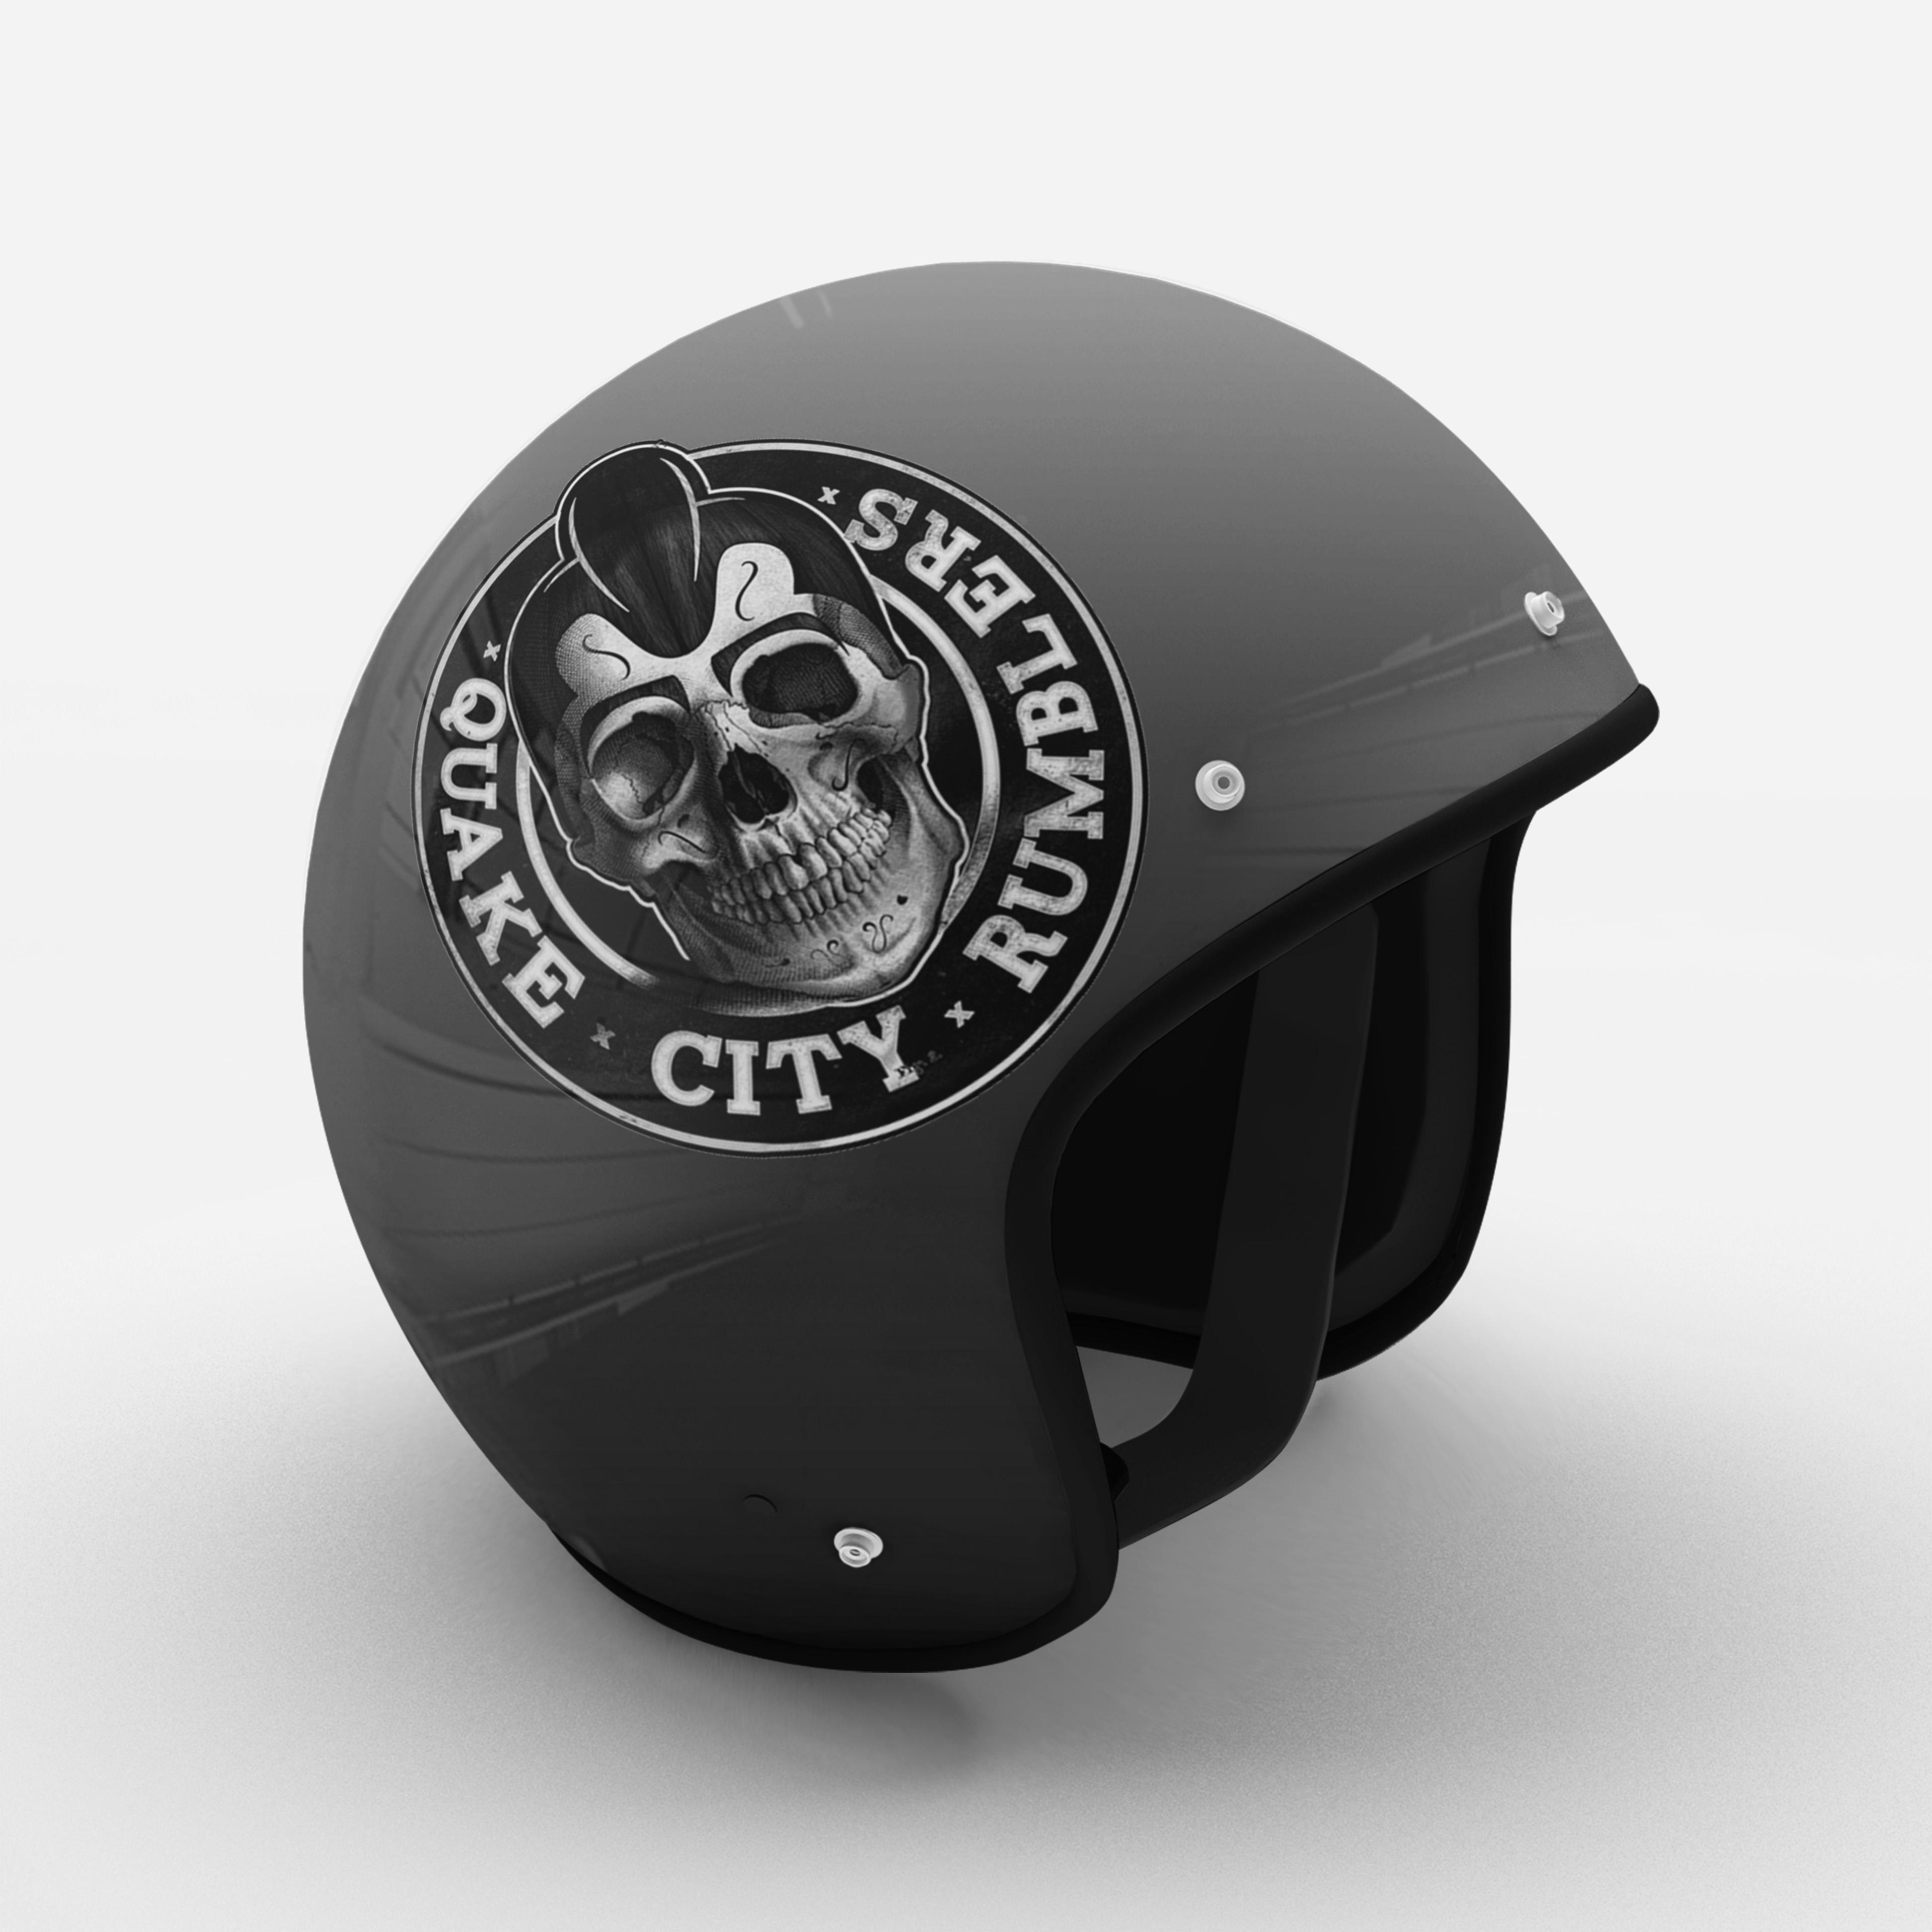 quake city rumbler logo on a motorcycle helmet